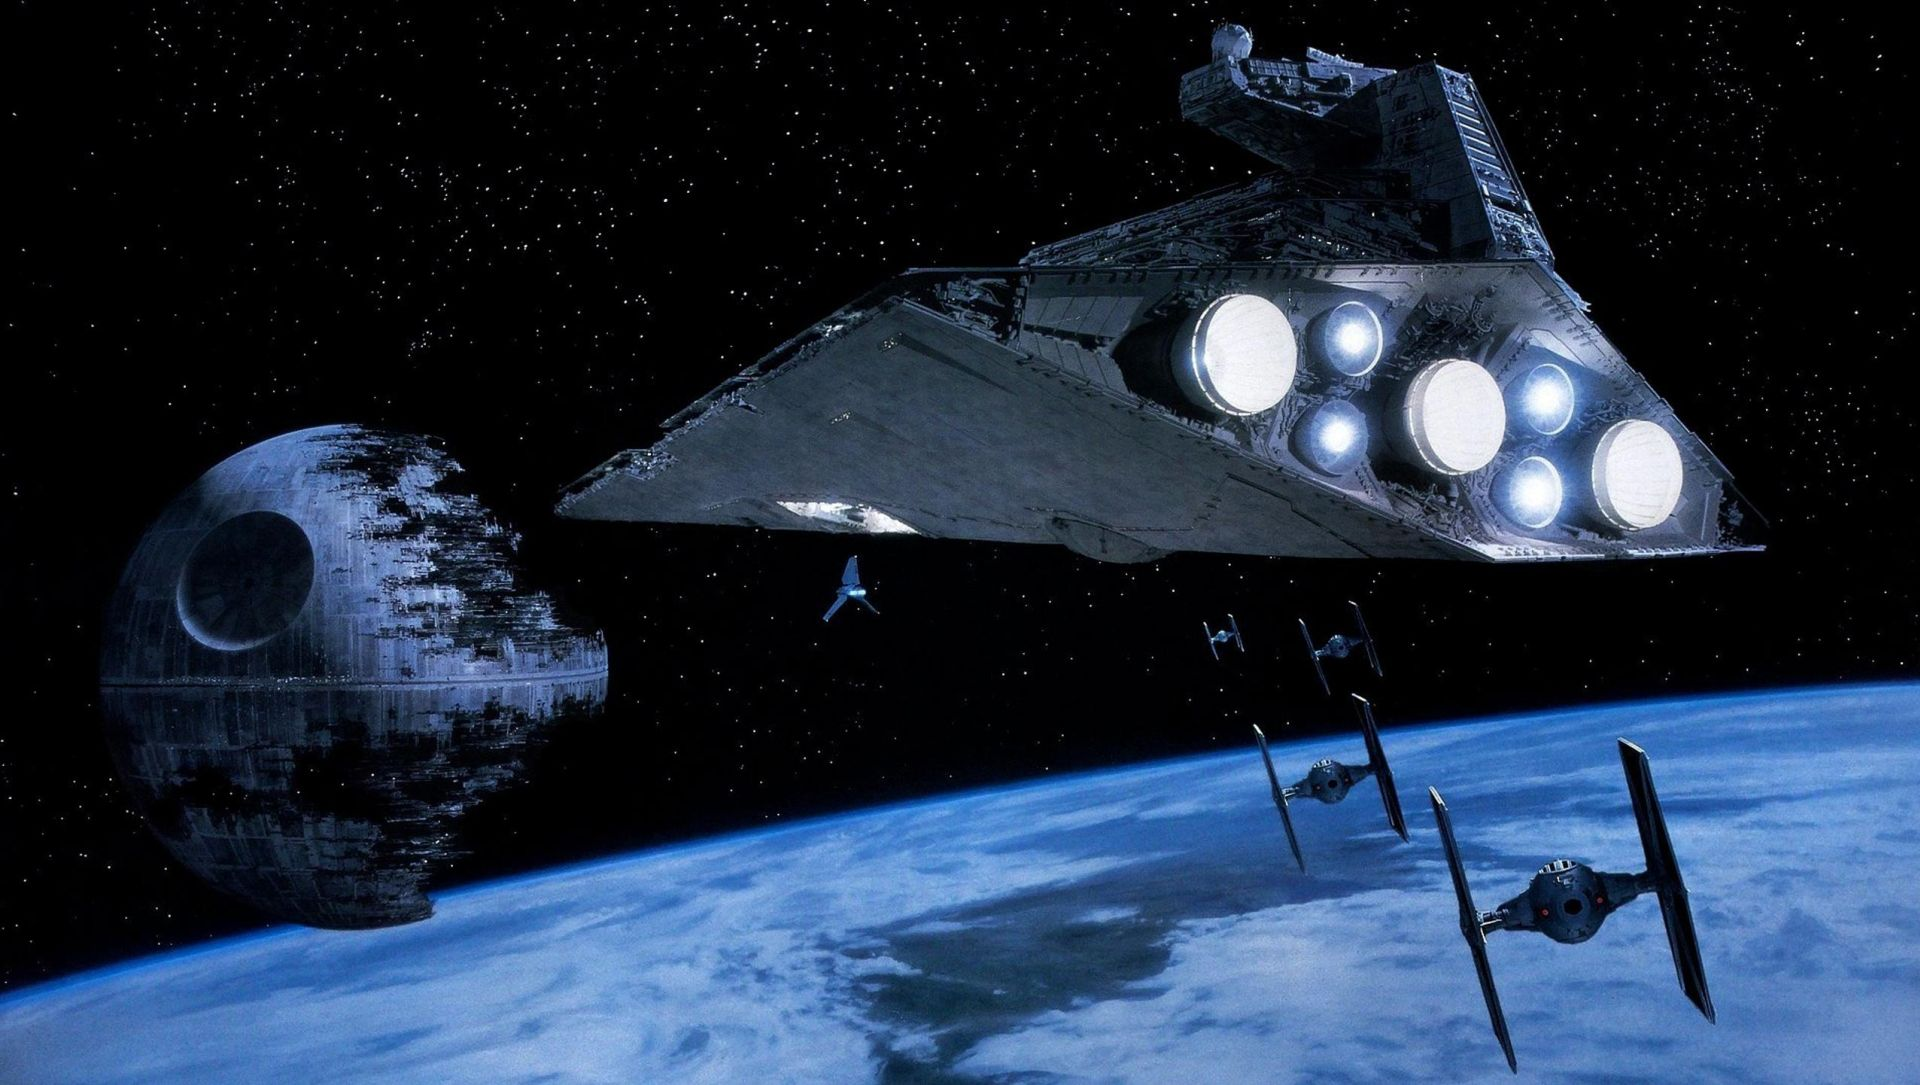 Star Wars Screensaver HD 1080 wallpaper